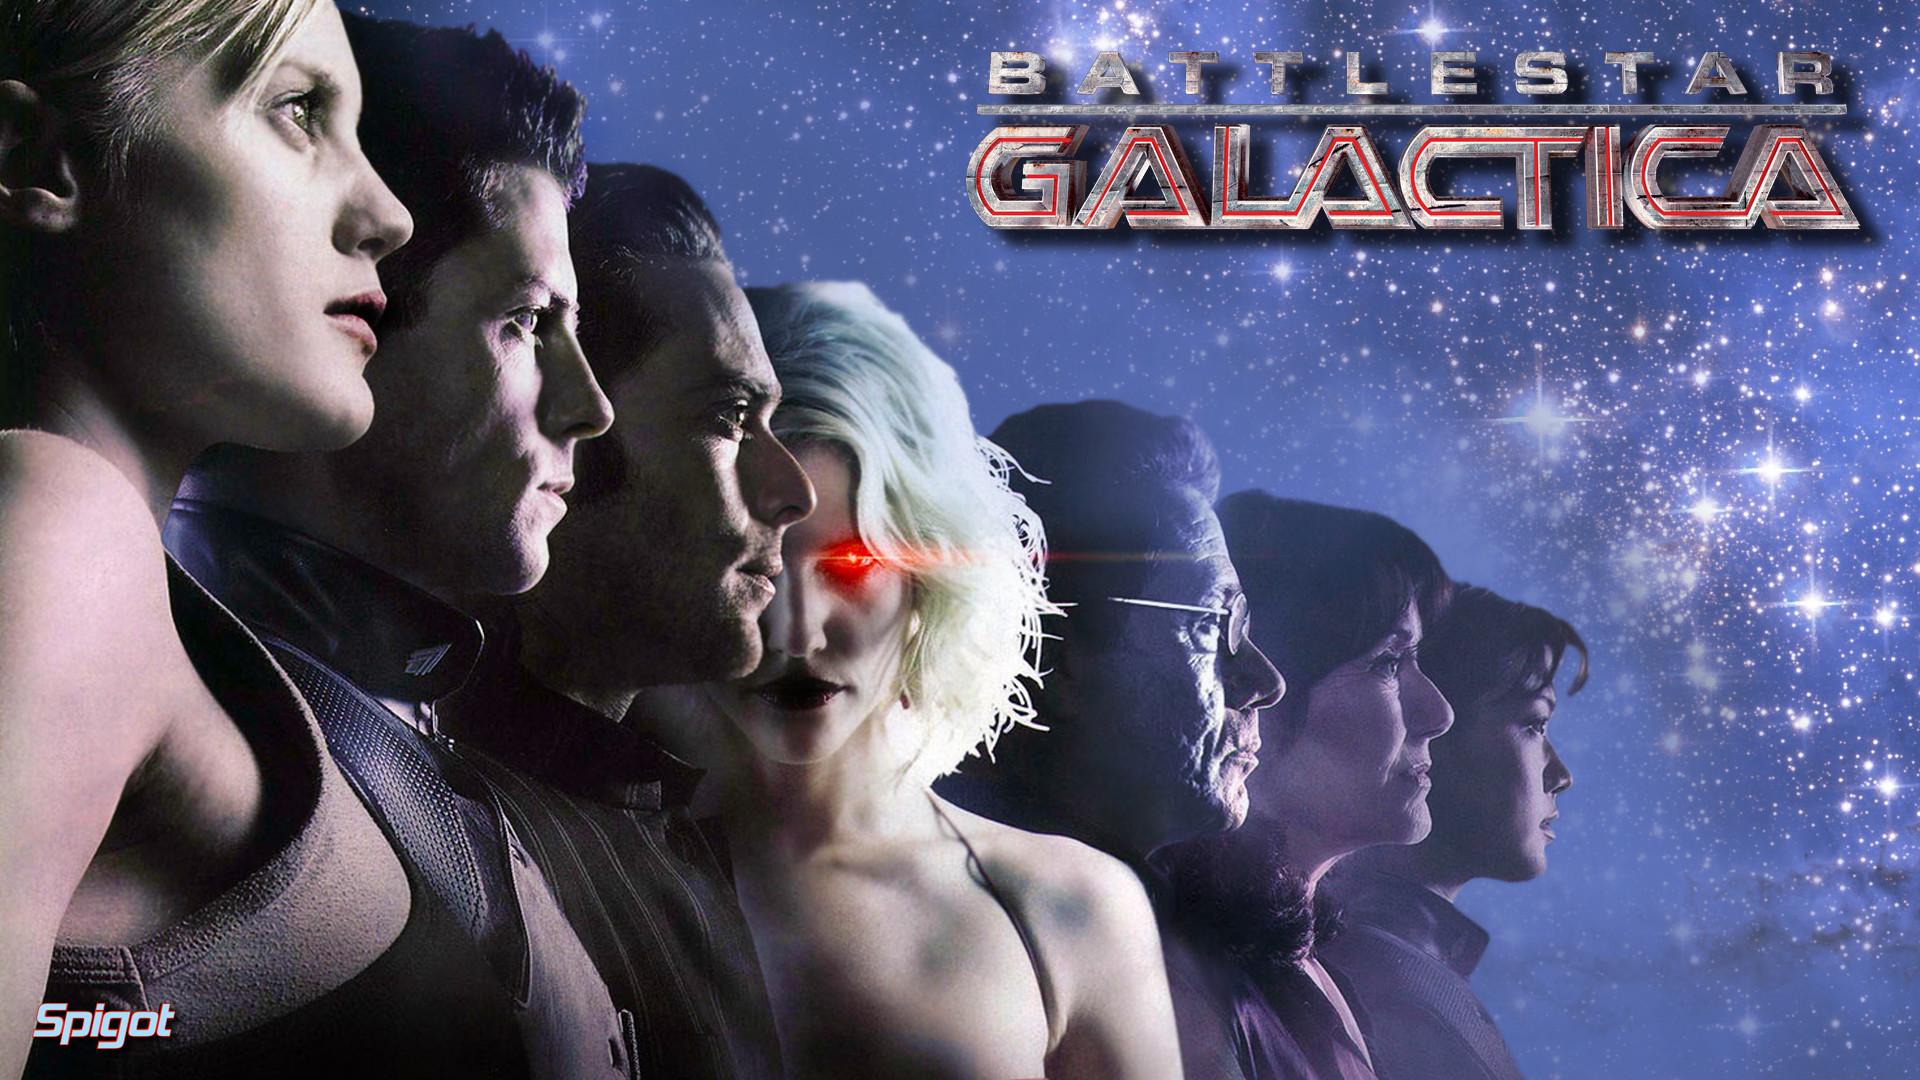 Battlestar galctica movie